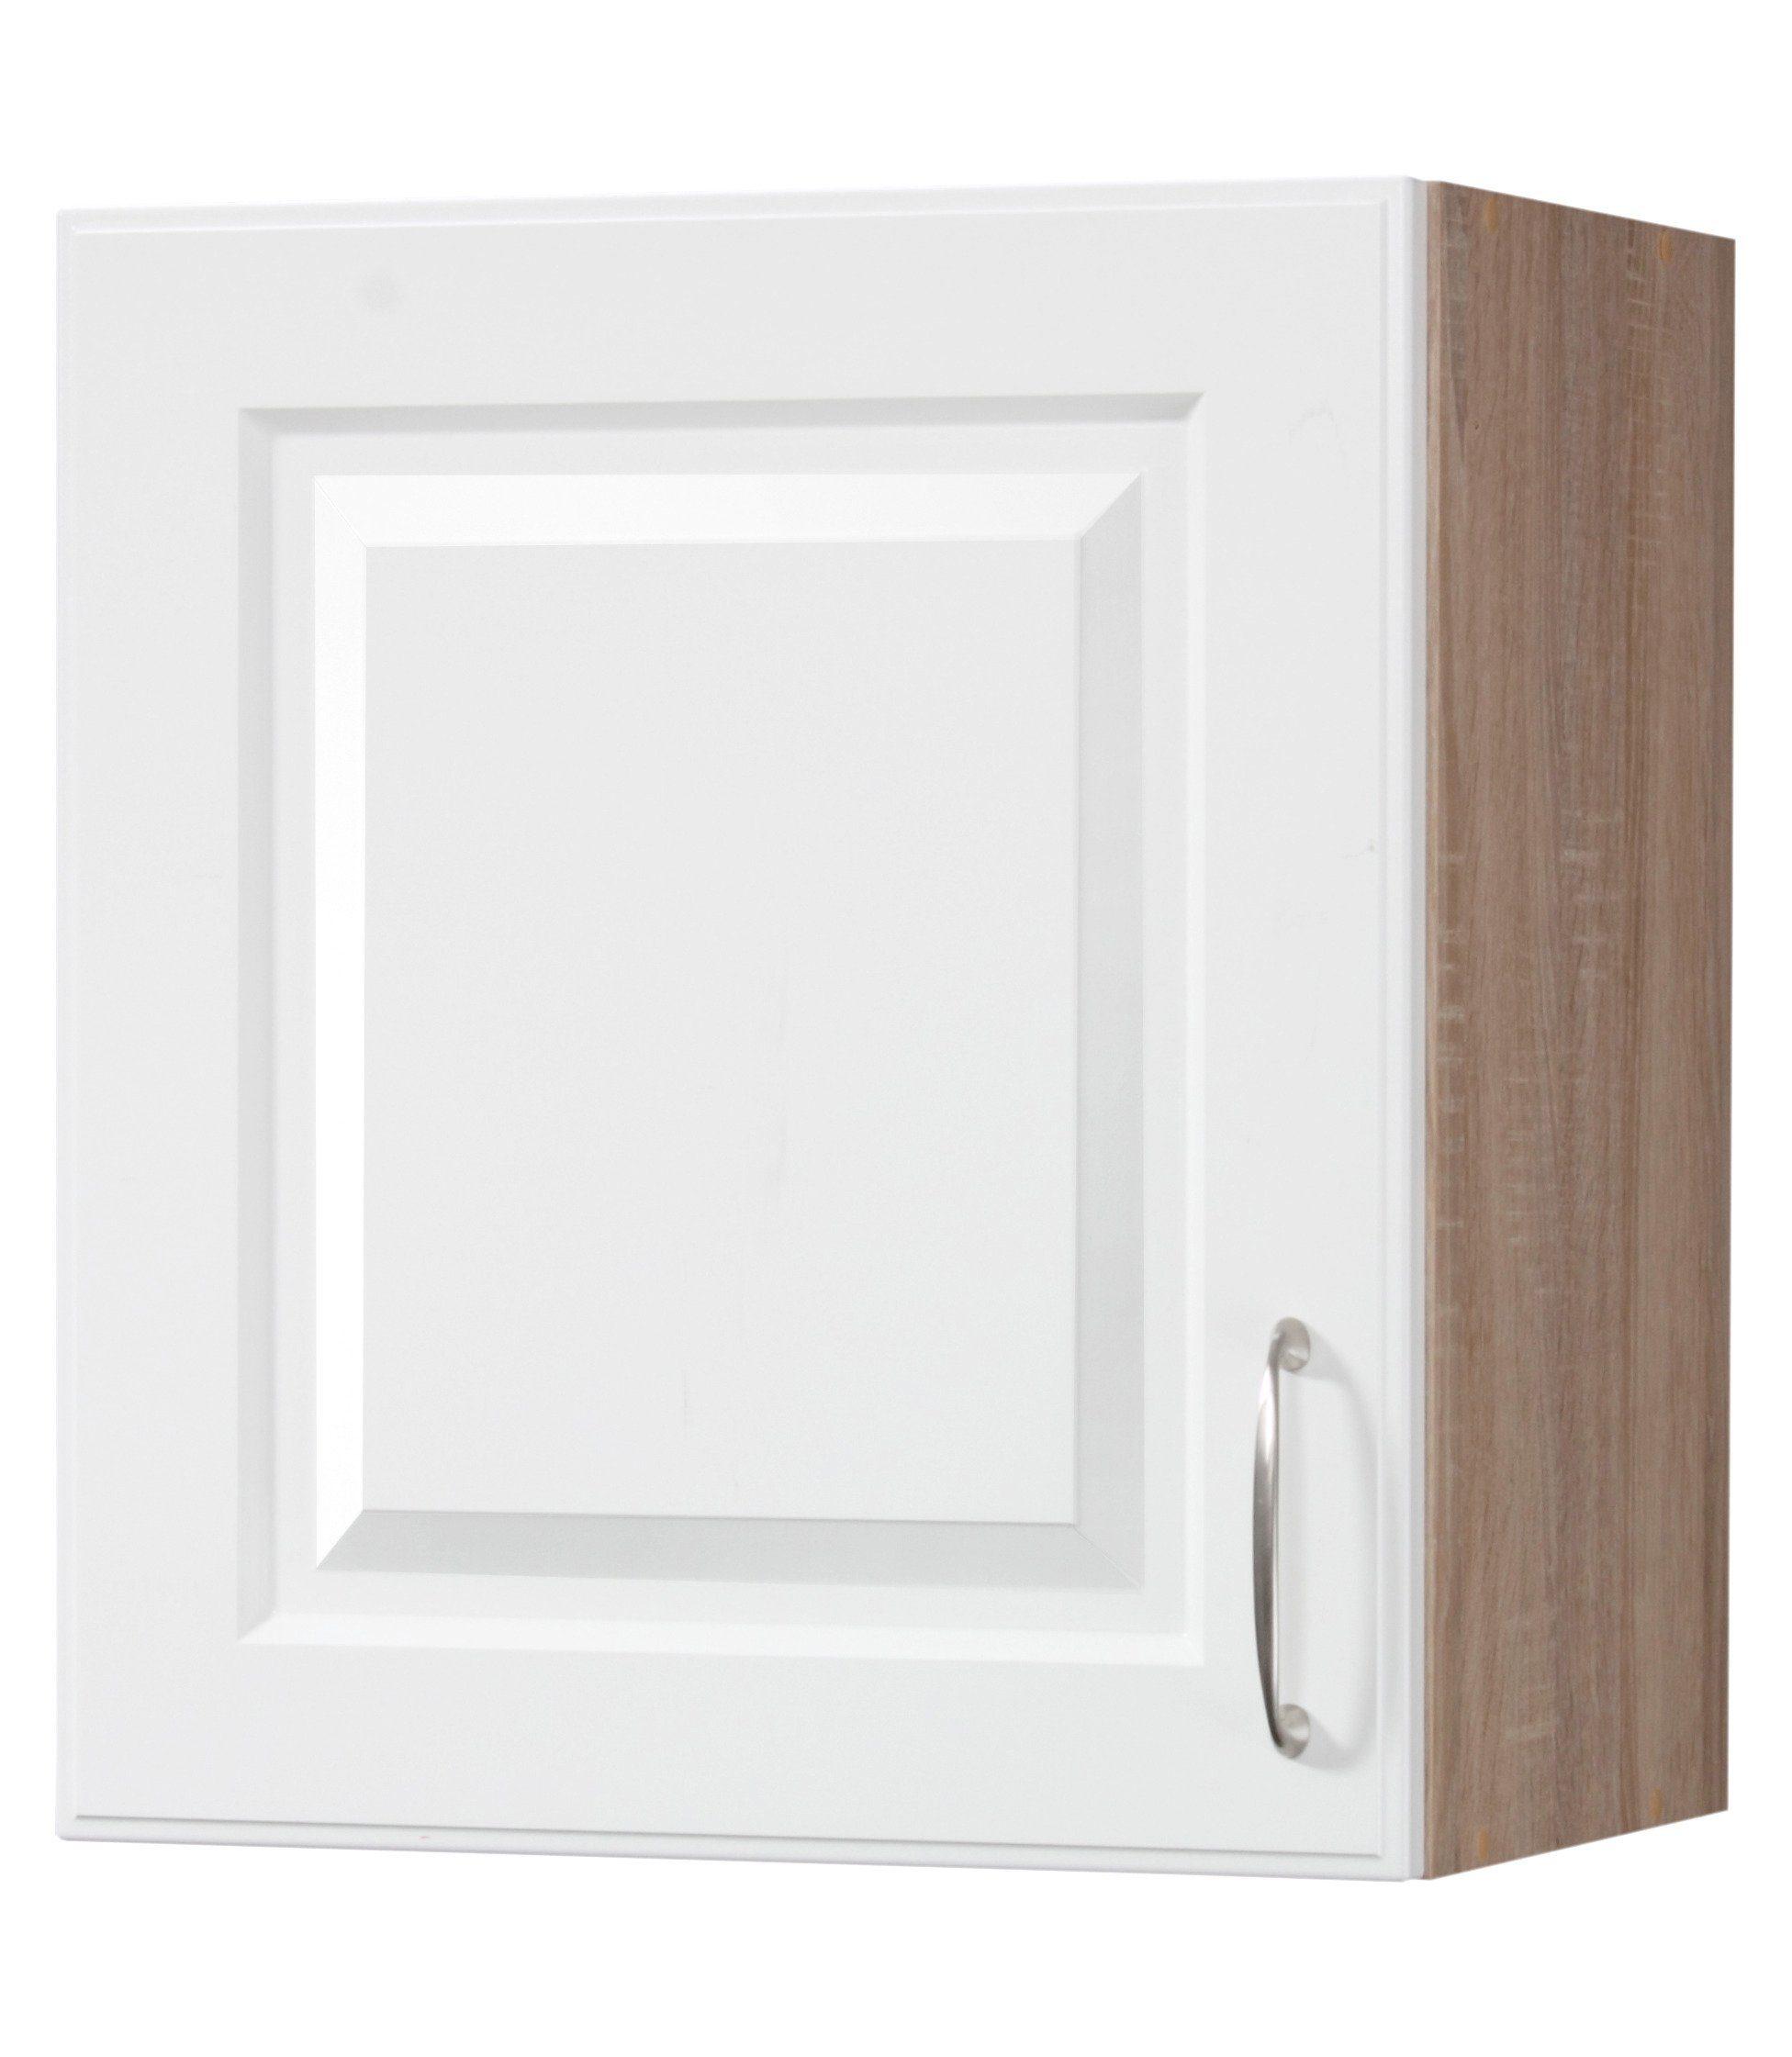 Küchenhängeschrank »Tilda«, B/T/H: 50/35/56 cm